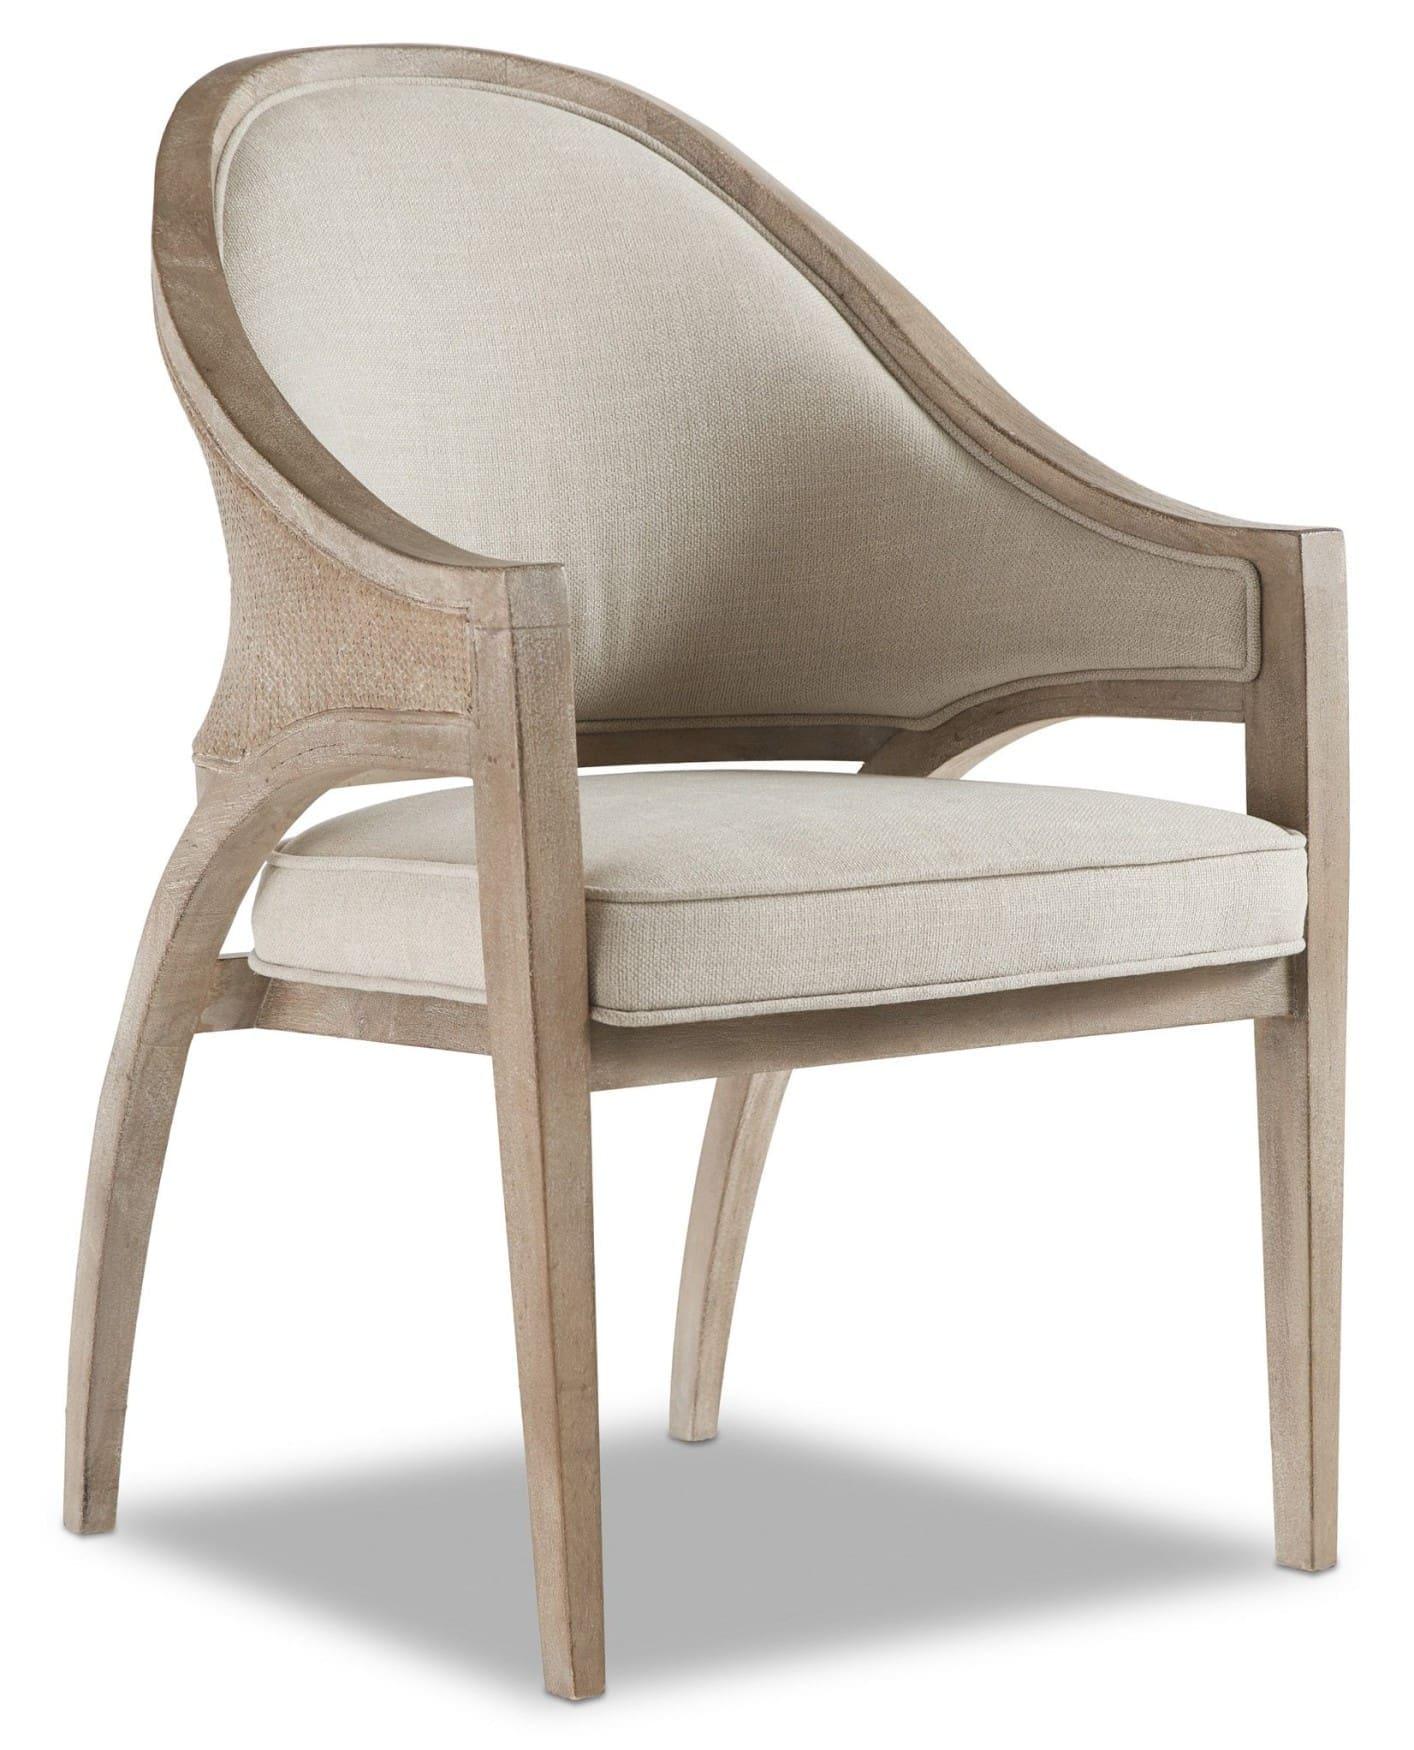 Affinity Sling Back Chair - Raffia Back